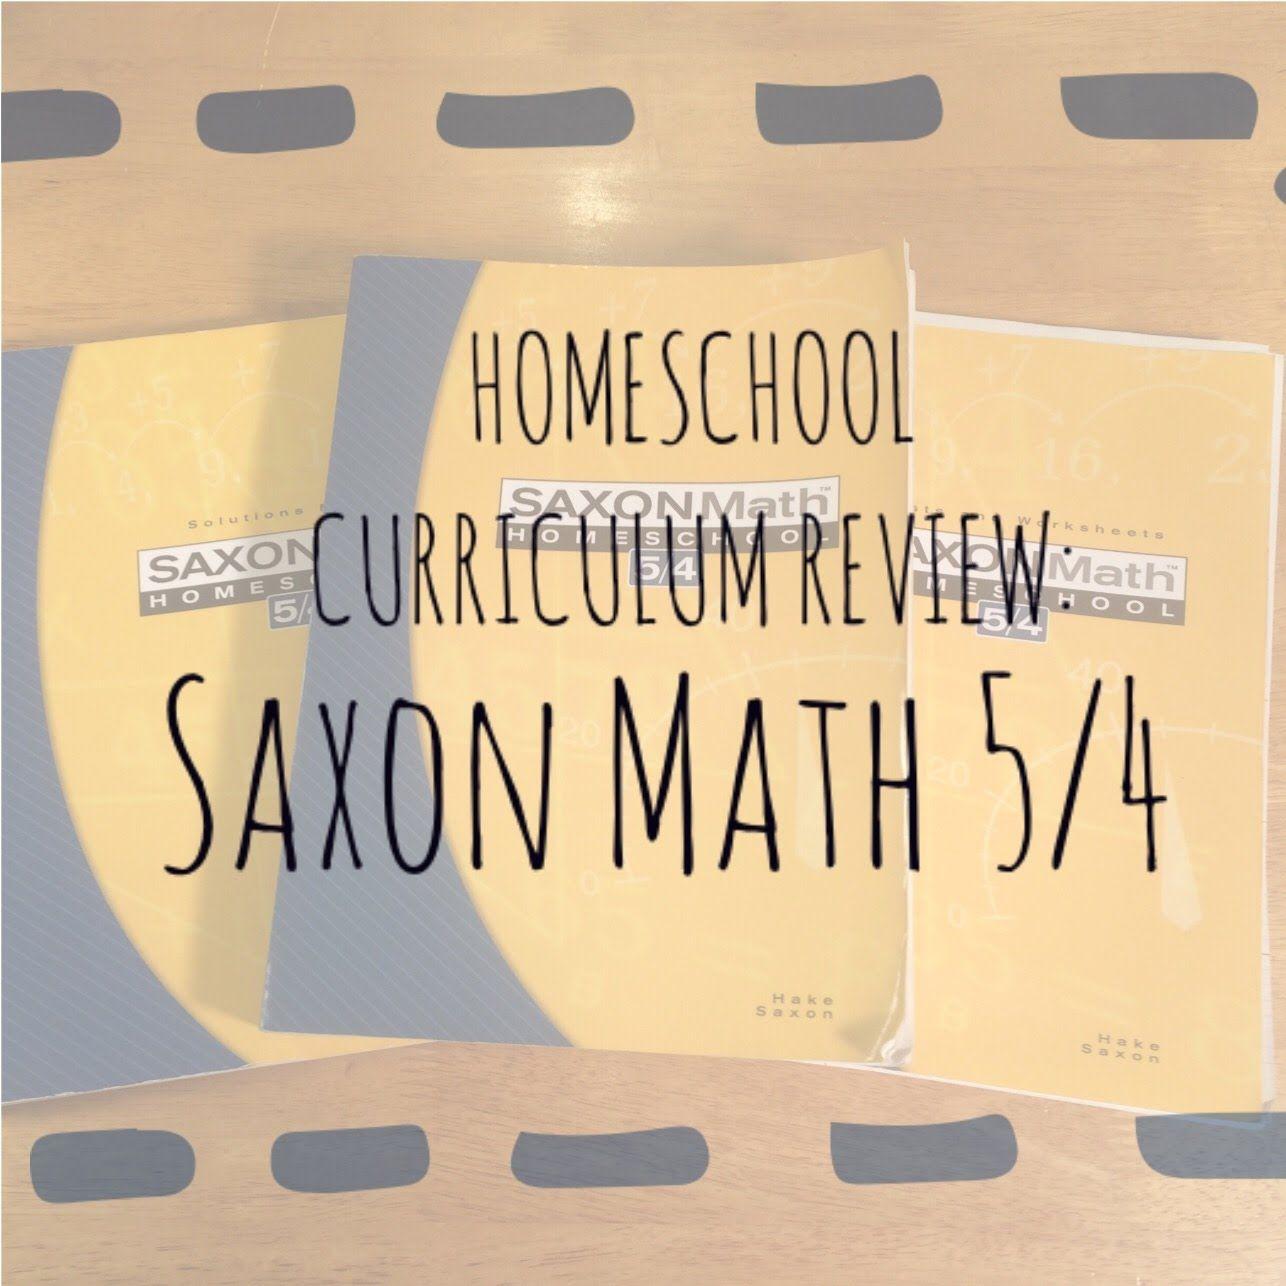 Homeschool Curriculum Review Saxon Math 5 4